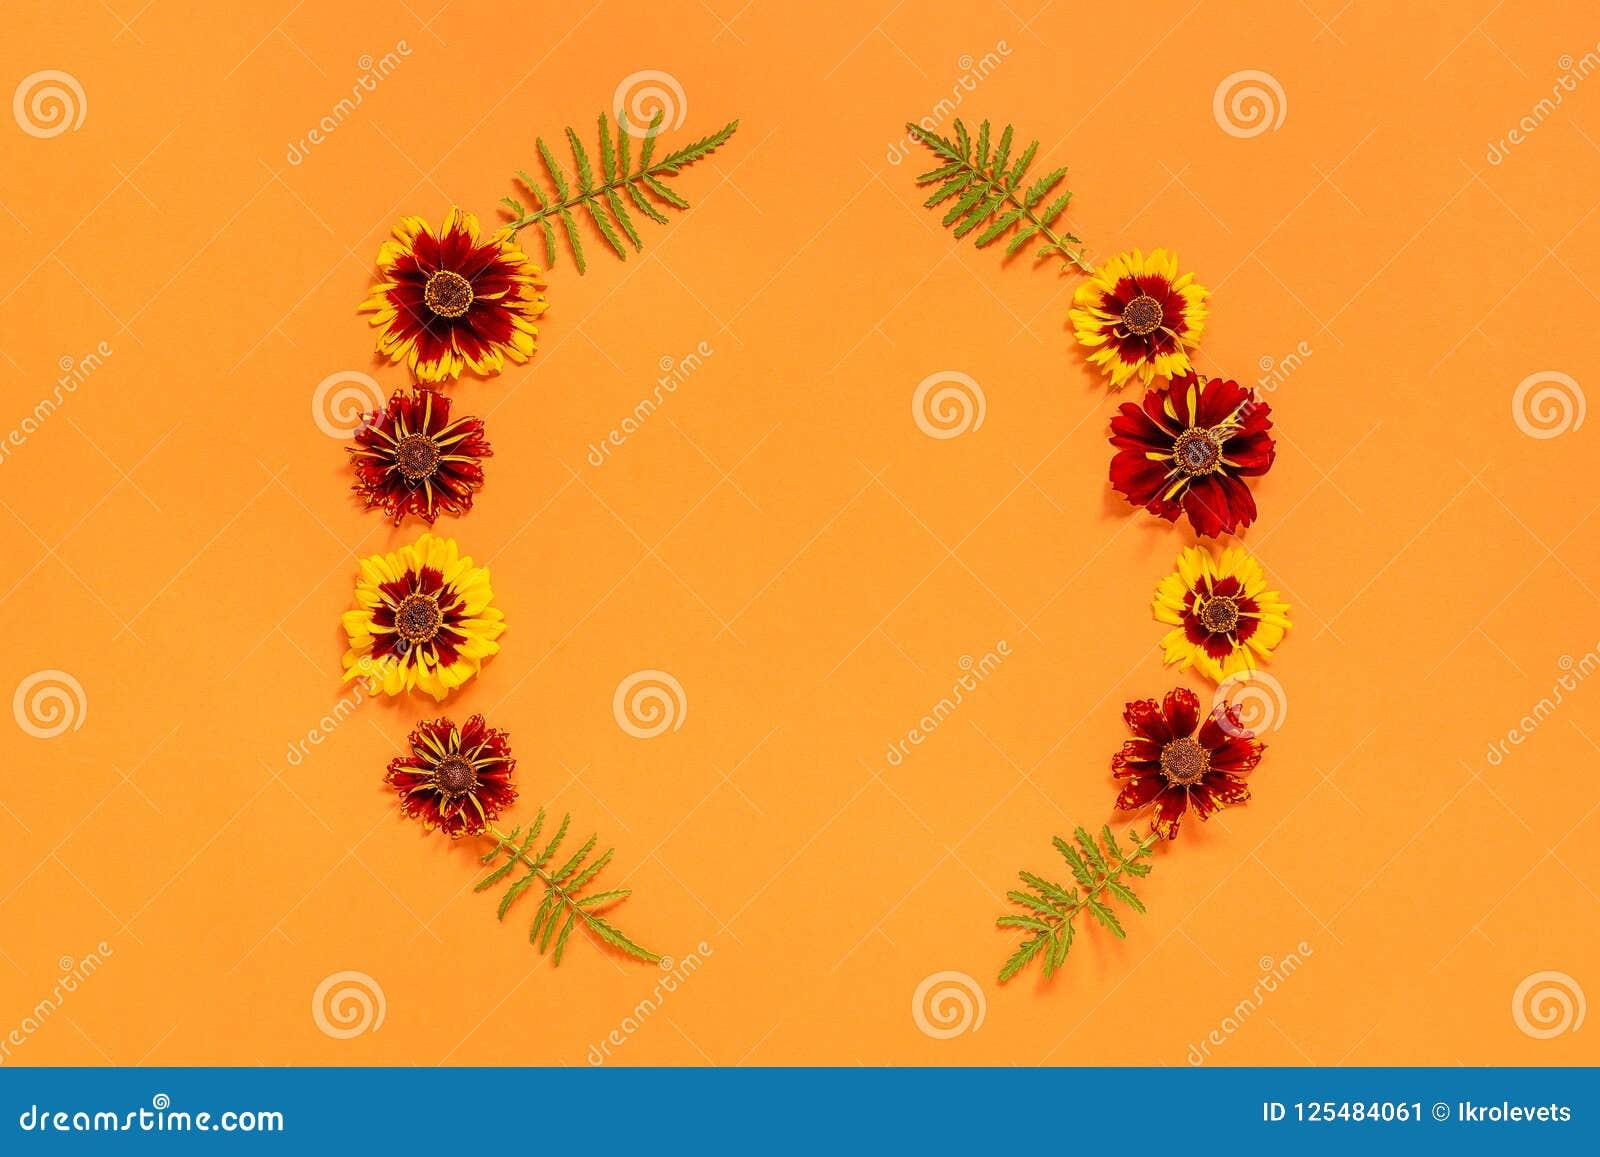 Yellow red flower frame on orange background